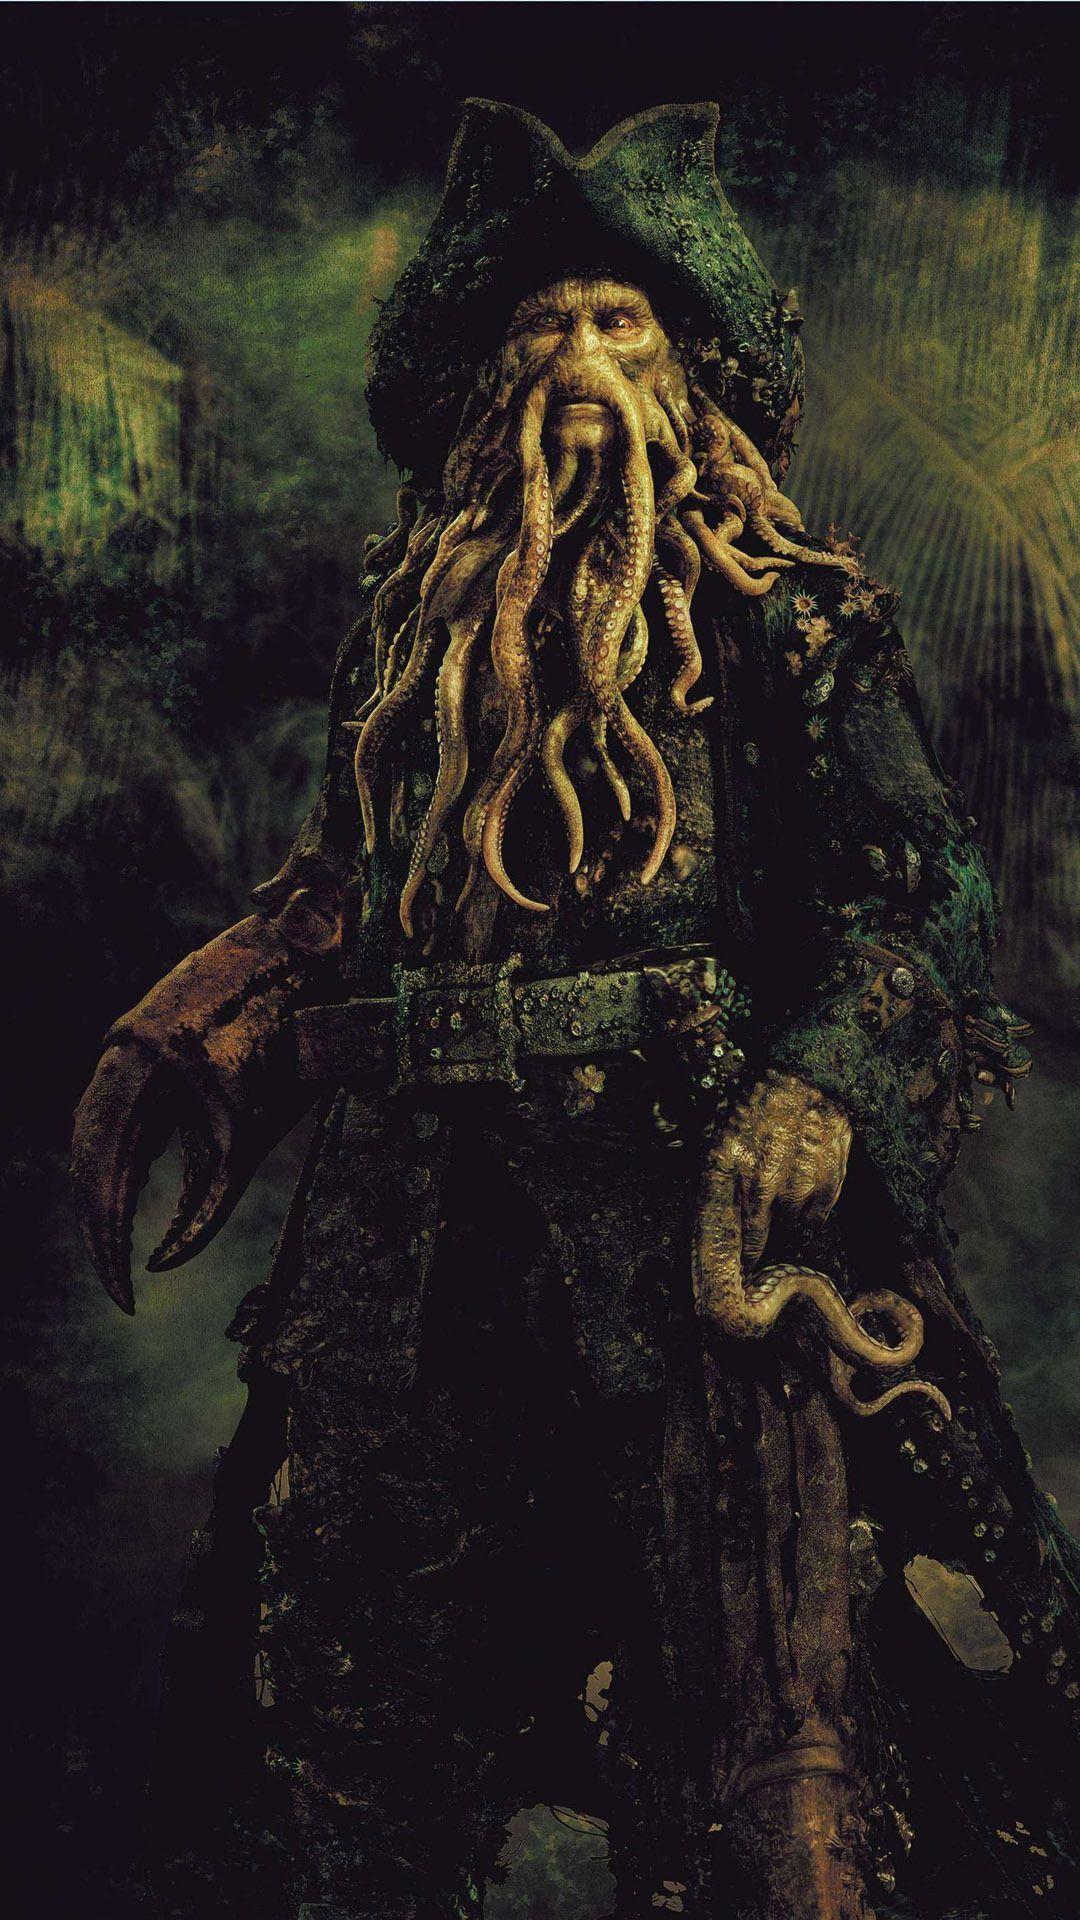 Davy Jones - Pirates of the Caribbean Mobile Wallpaper 10754